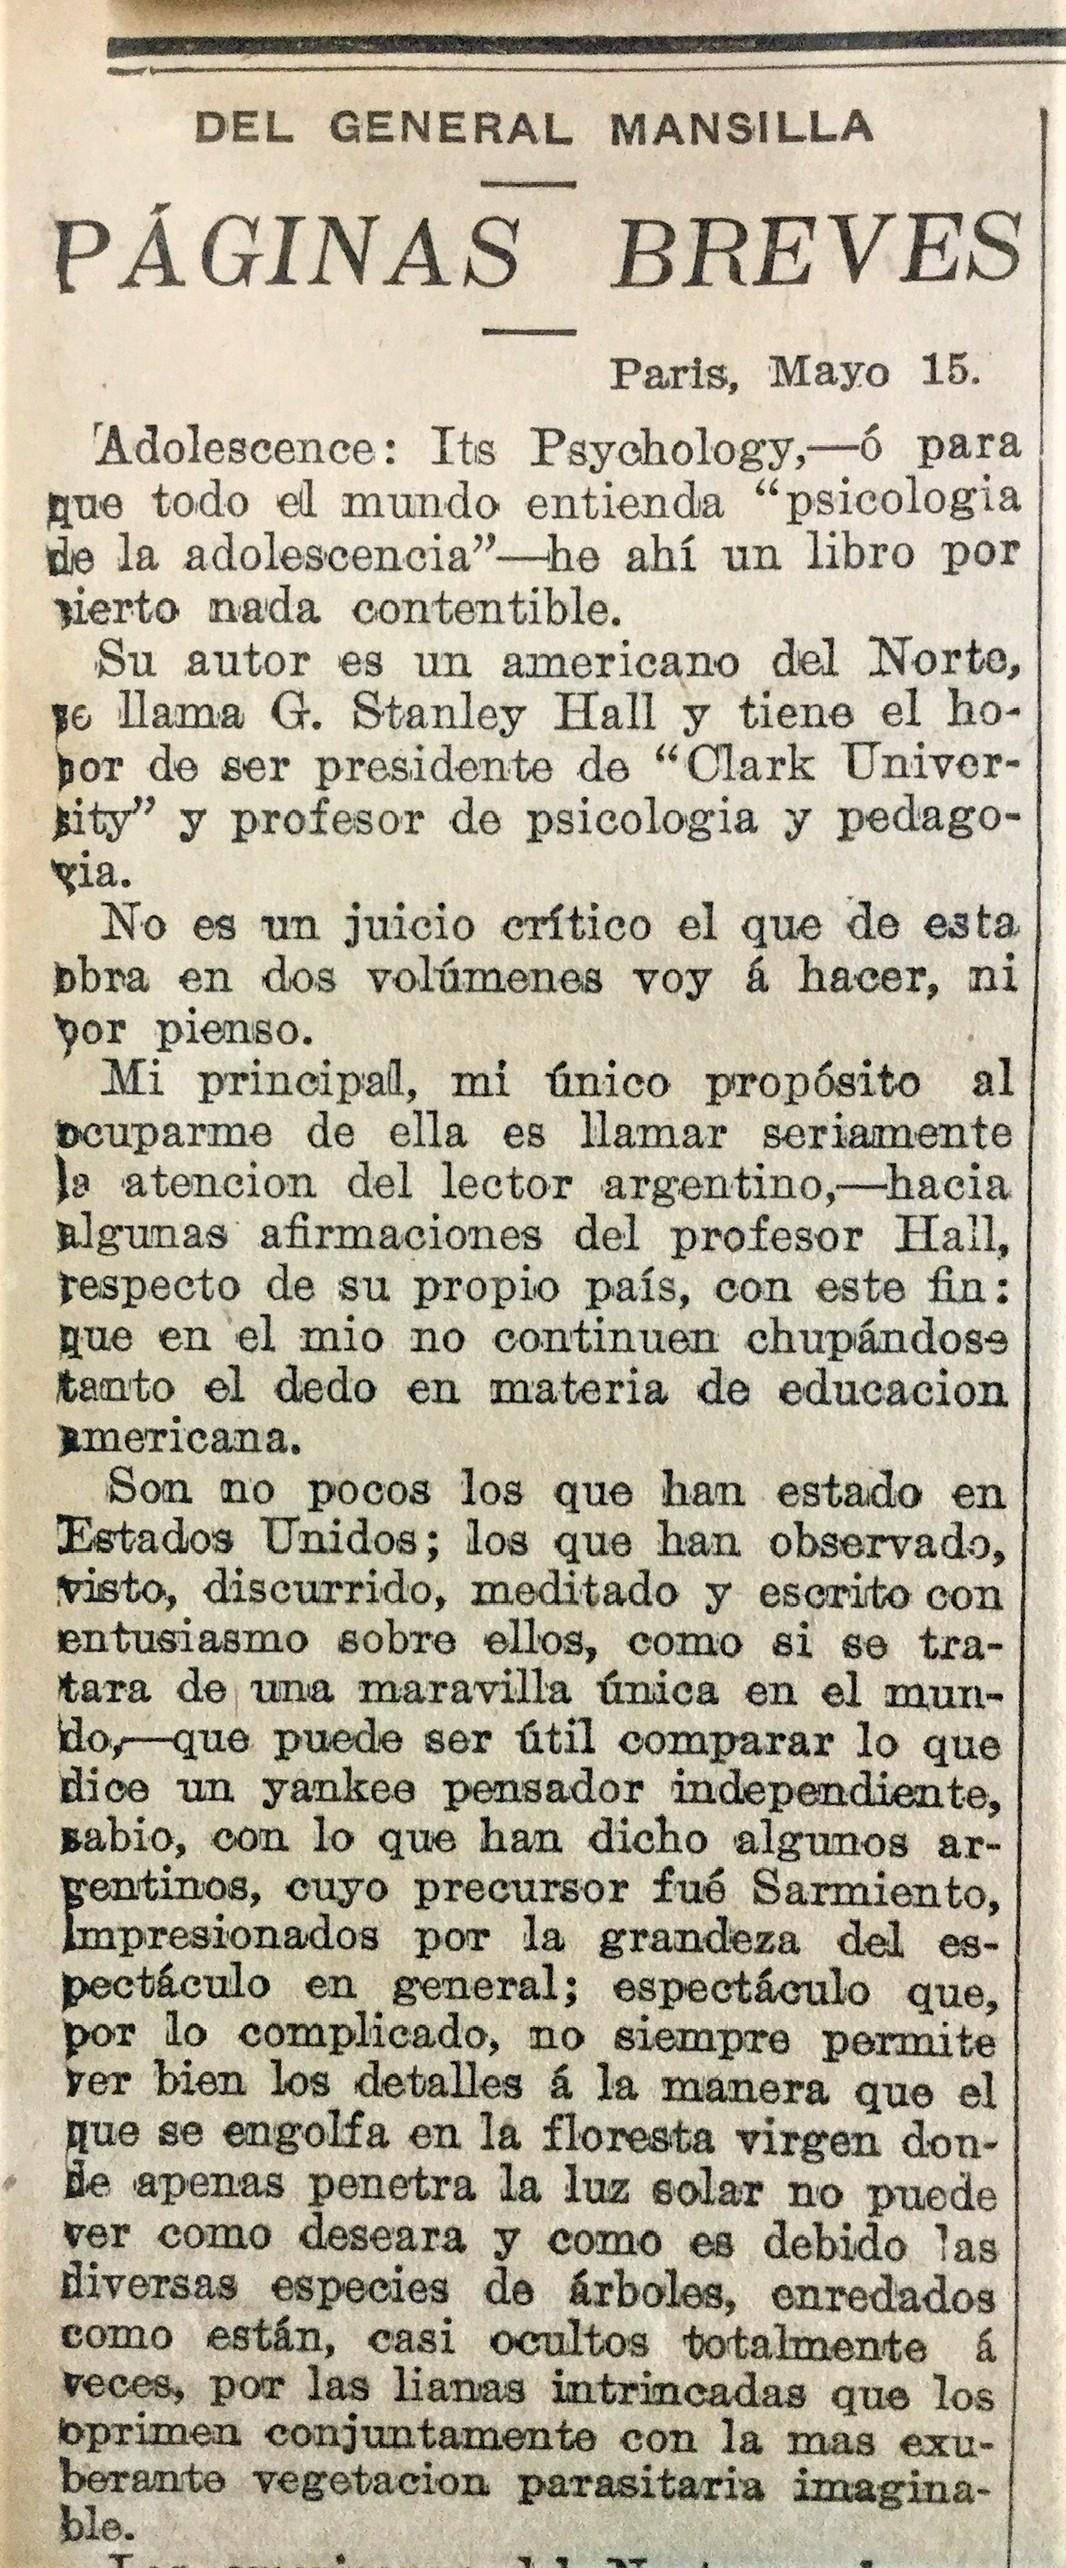 C:UsersnataliaDesktopLucioPAGINAS BREVES.FotosPaginas breves.1908PB.1908.07.JULIOIMG-4095.jpg